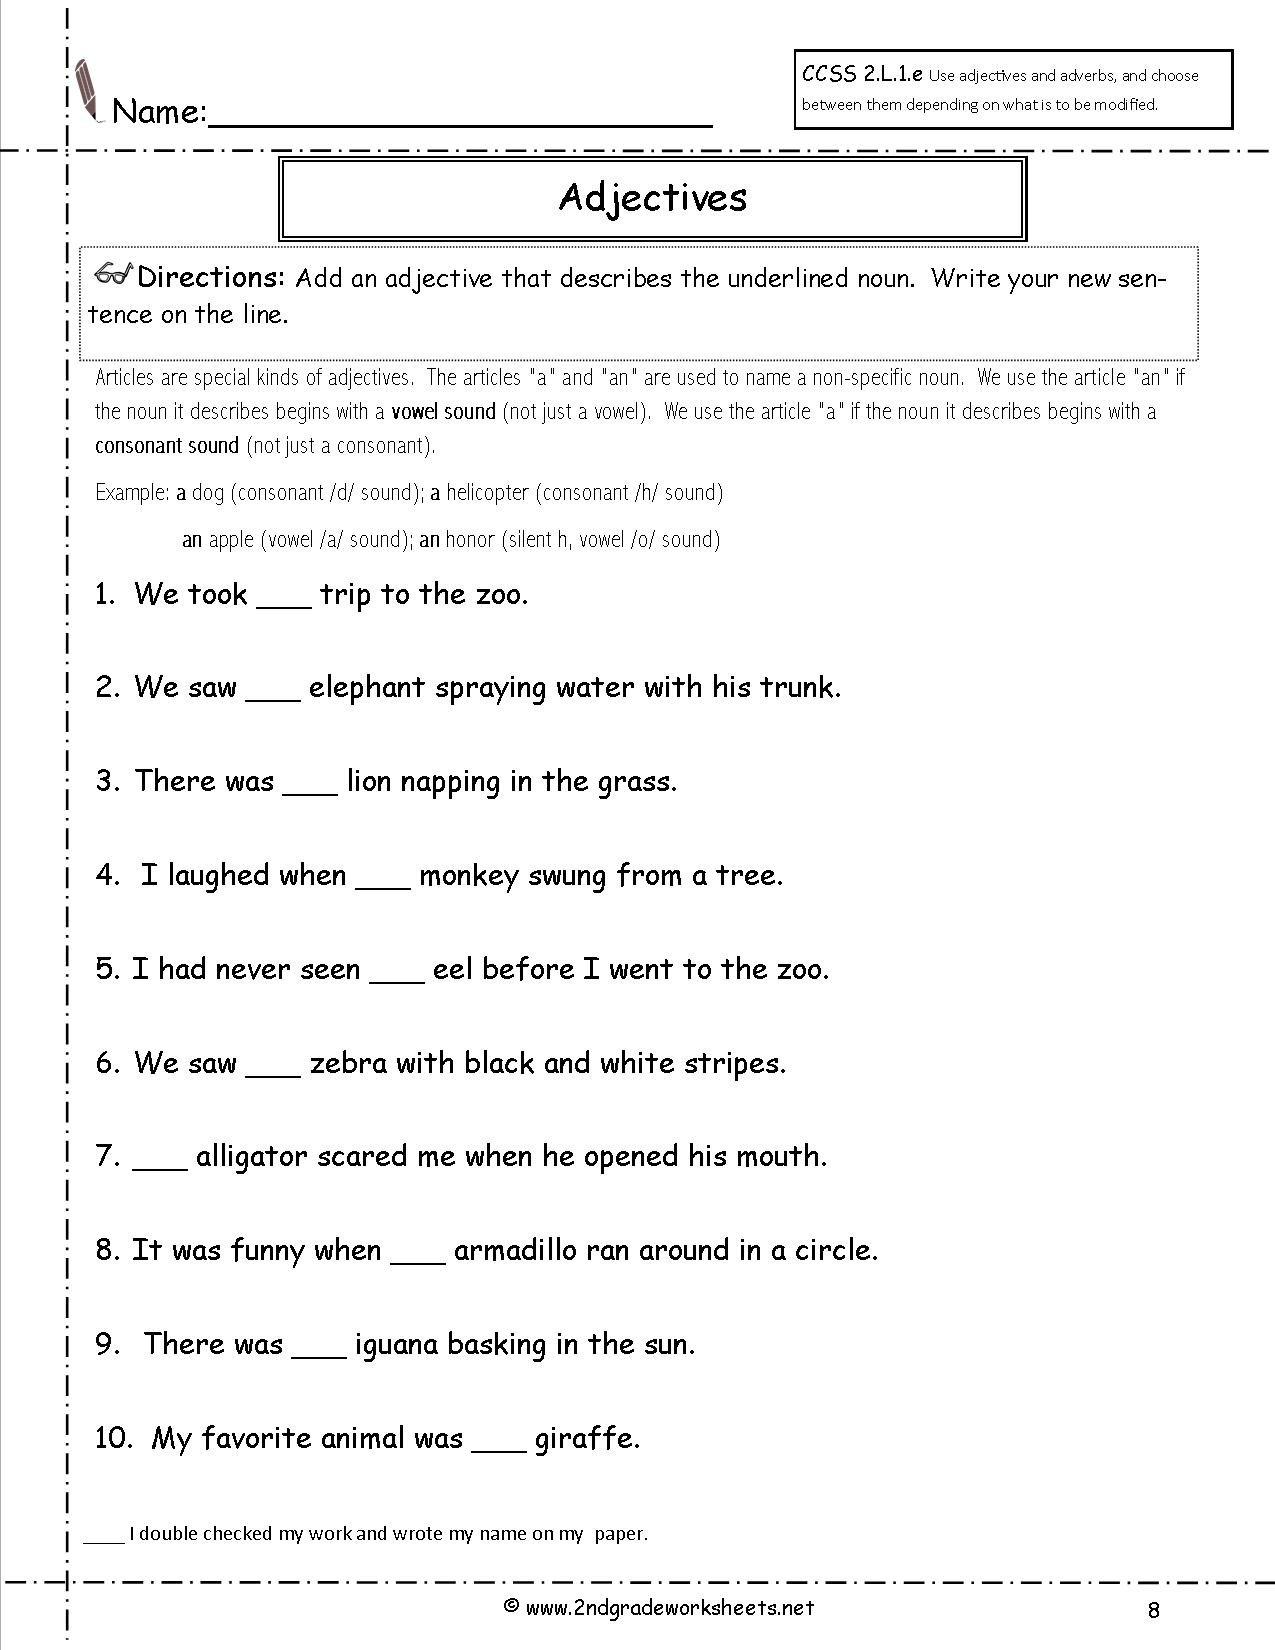 Free Languagegrammar Worksheets And Printouts Within Printable English Worksheets